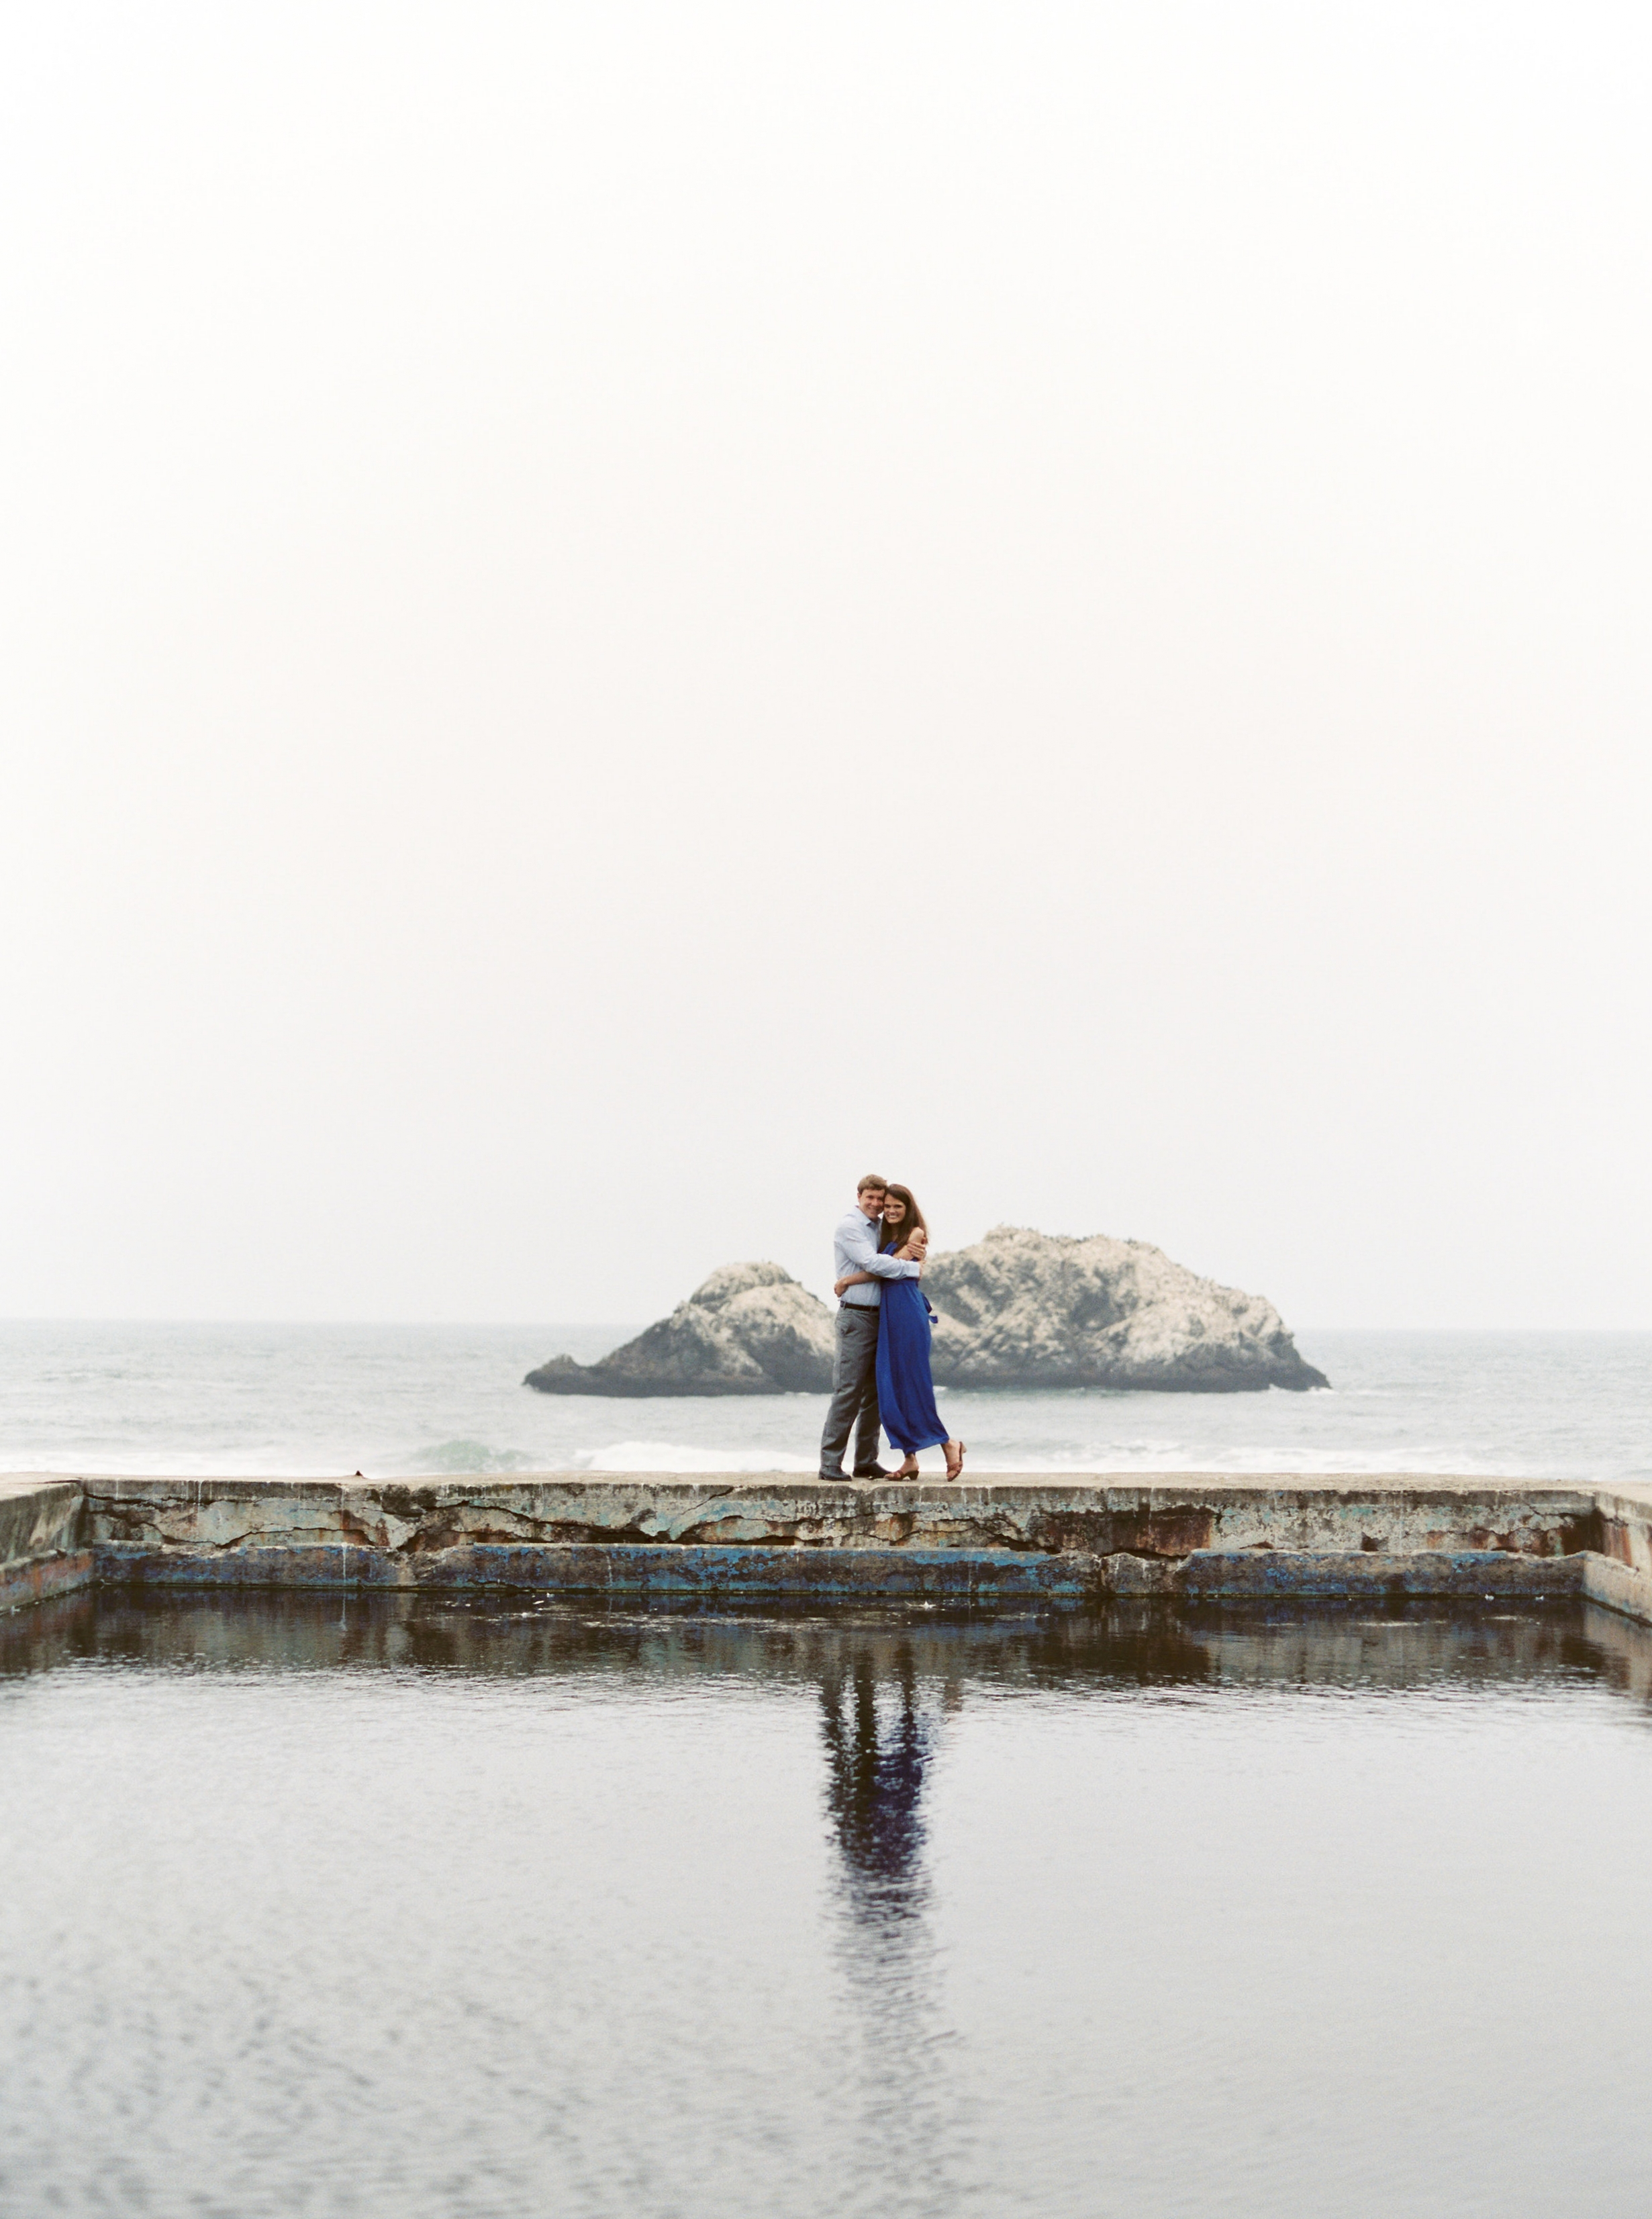 sutro-baths-san-francisco-california-engagement-1.jpg